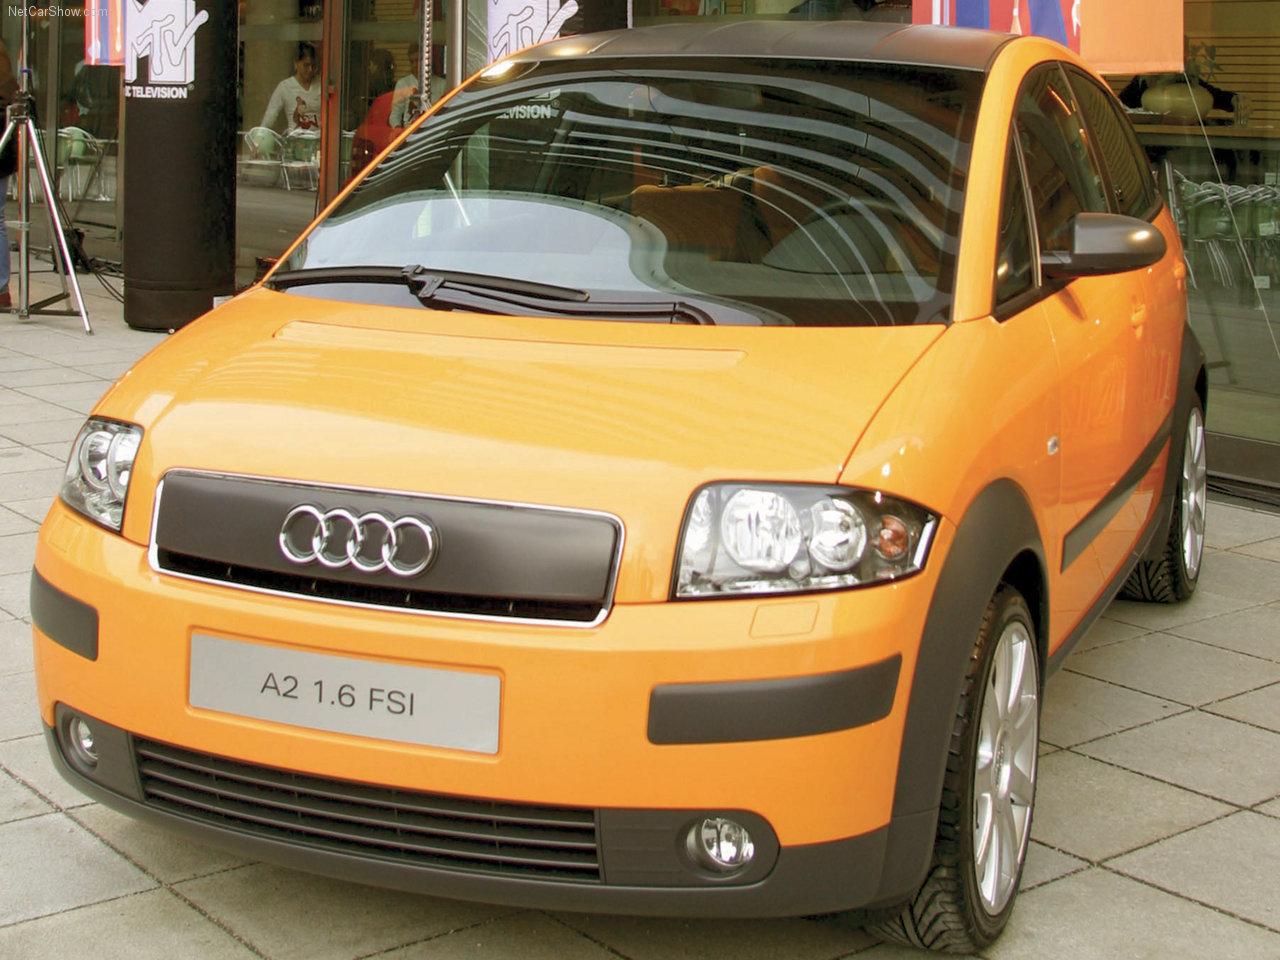 Audi A2 2002 Audi-A2-2002-1280-1e